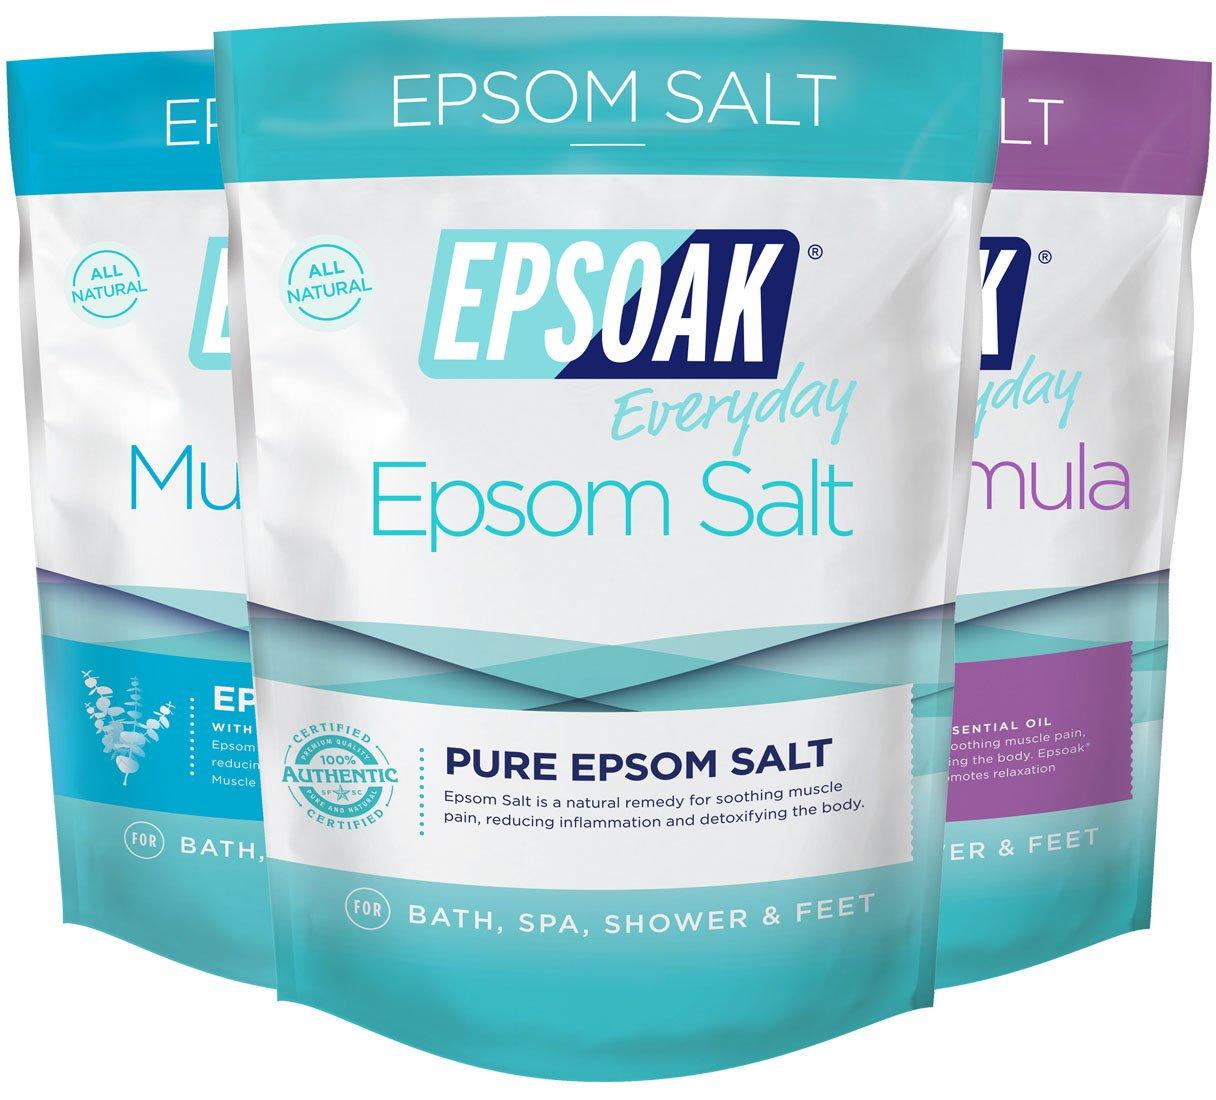 Ultimate Epsoak Epsom Salt Bath Soak Bundle (6lbs) – 3 pack of Sleep Formula Bath Salt, Muscle Soak Bath Salt, Original Unscented Epsom Salts San Francisco Salt Company